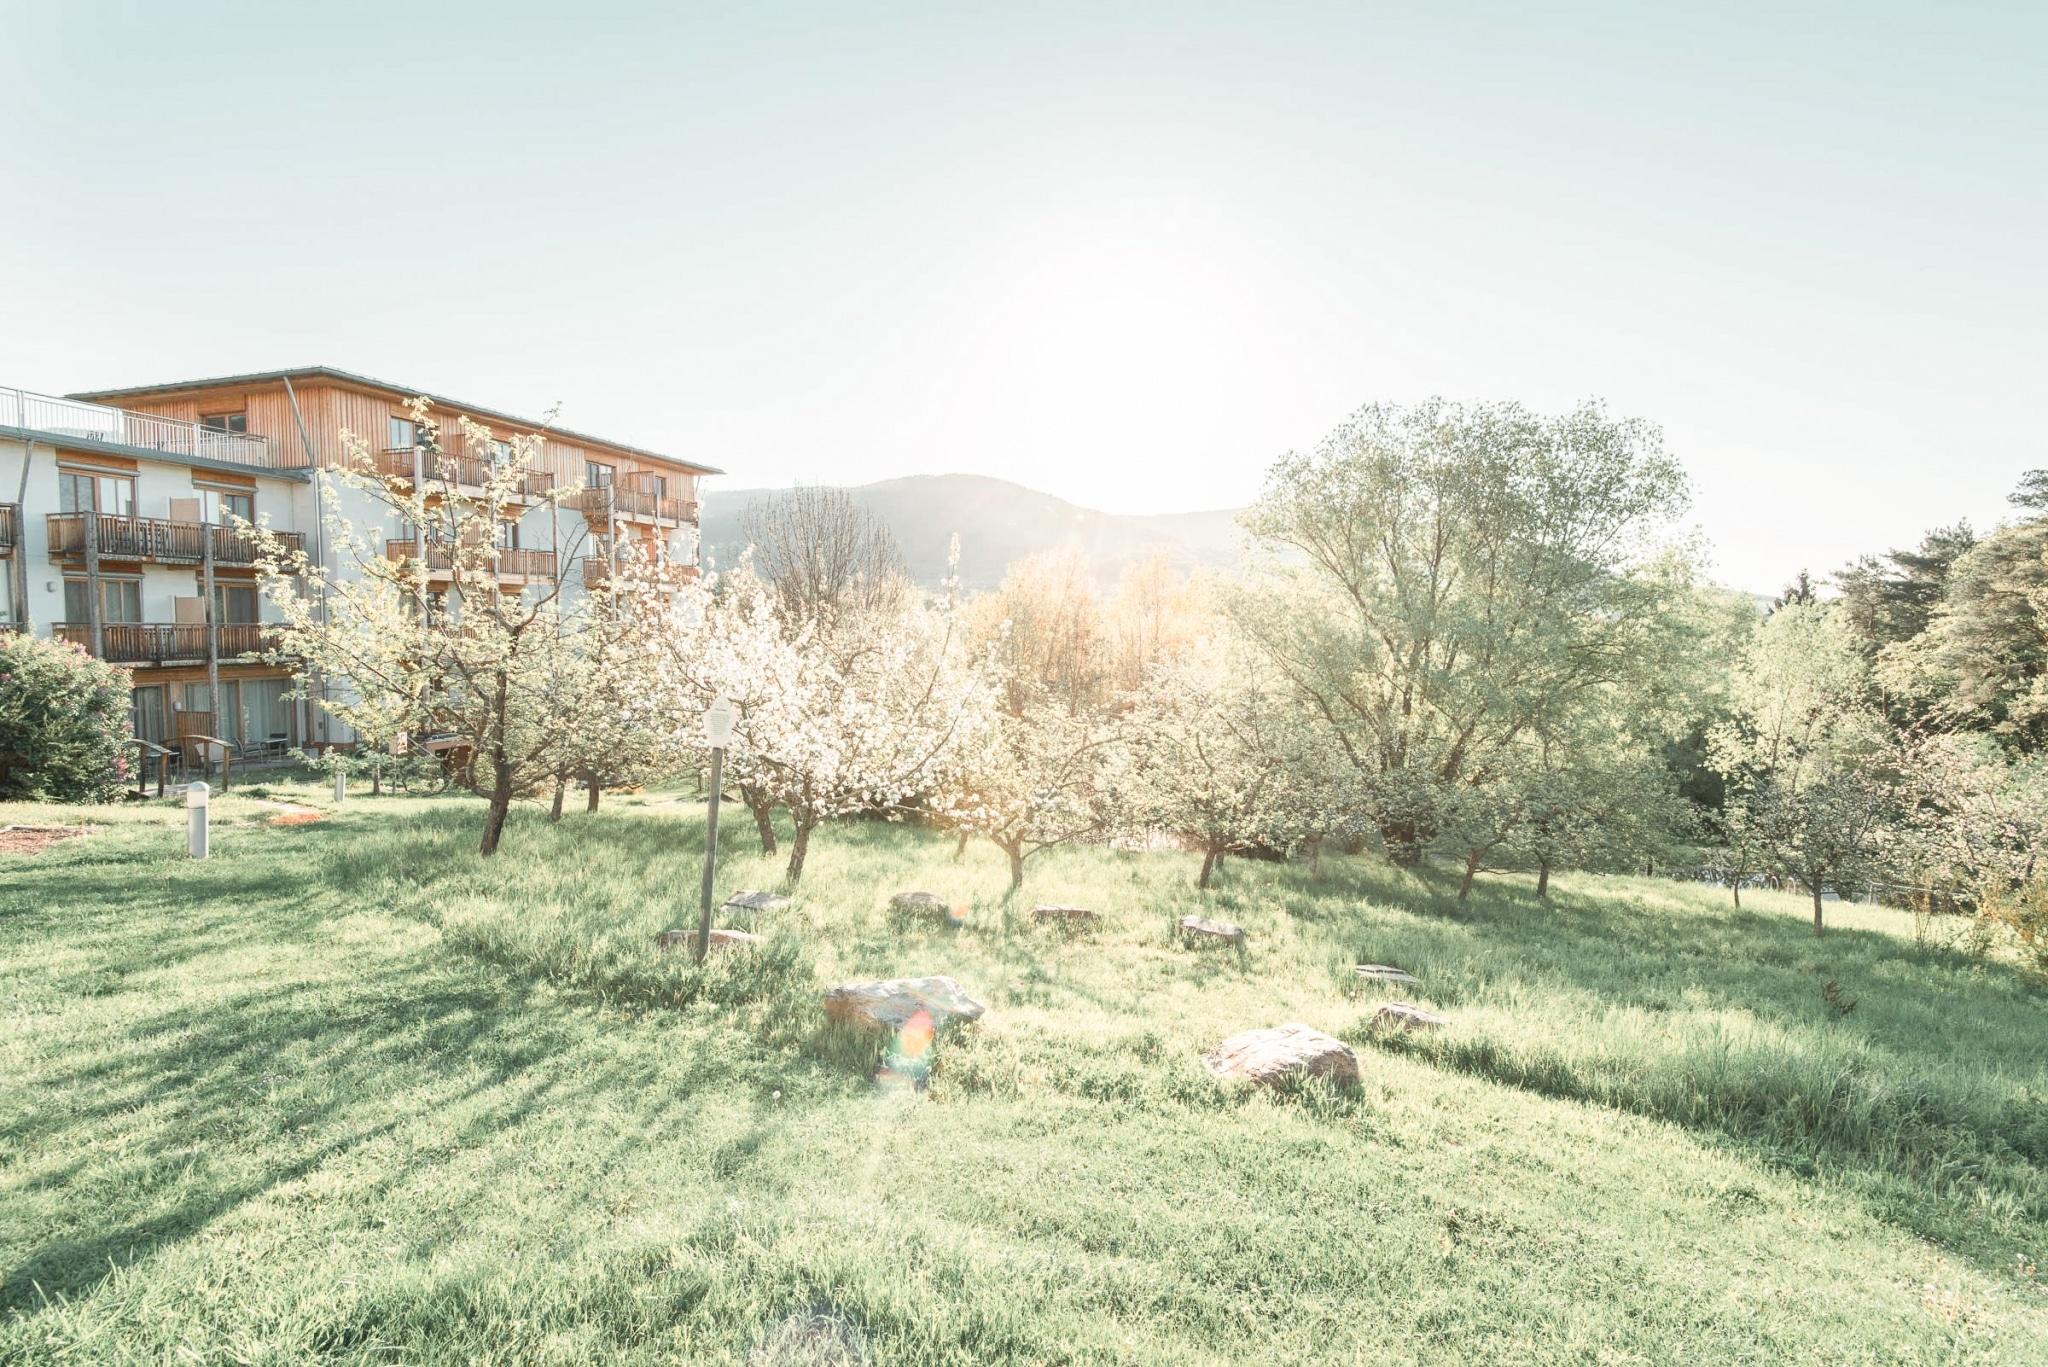 Bäume mit Blüten Hotel Retter